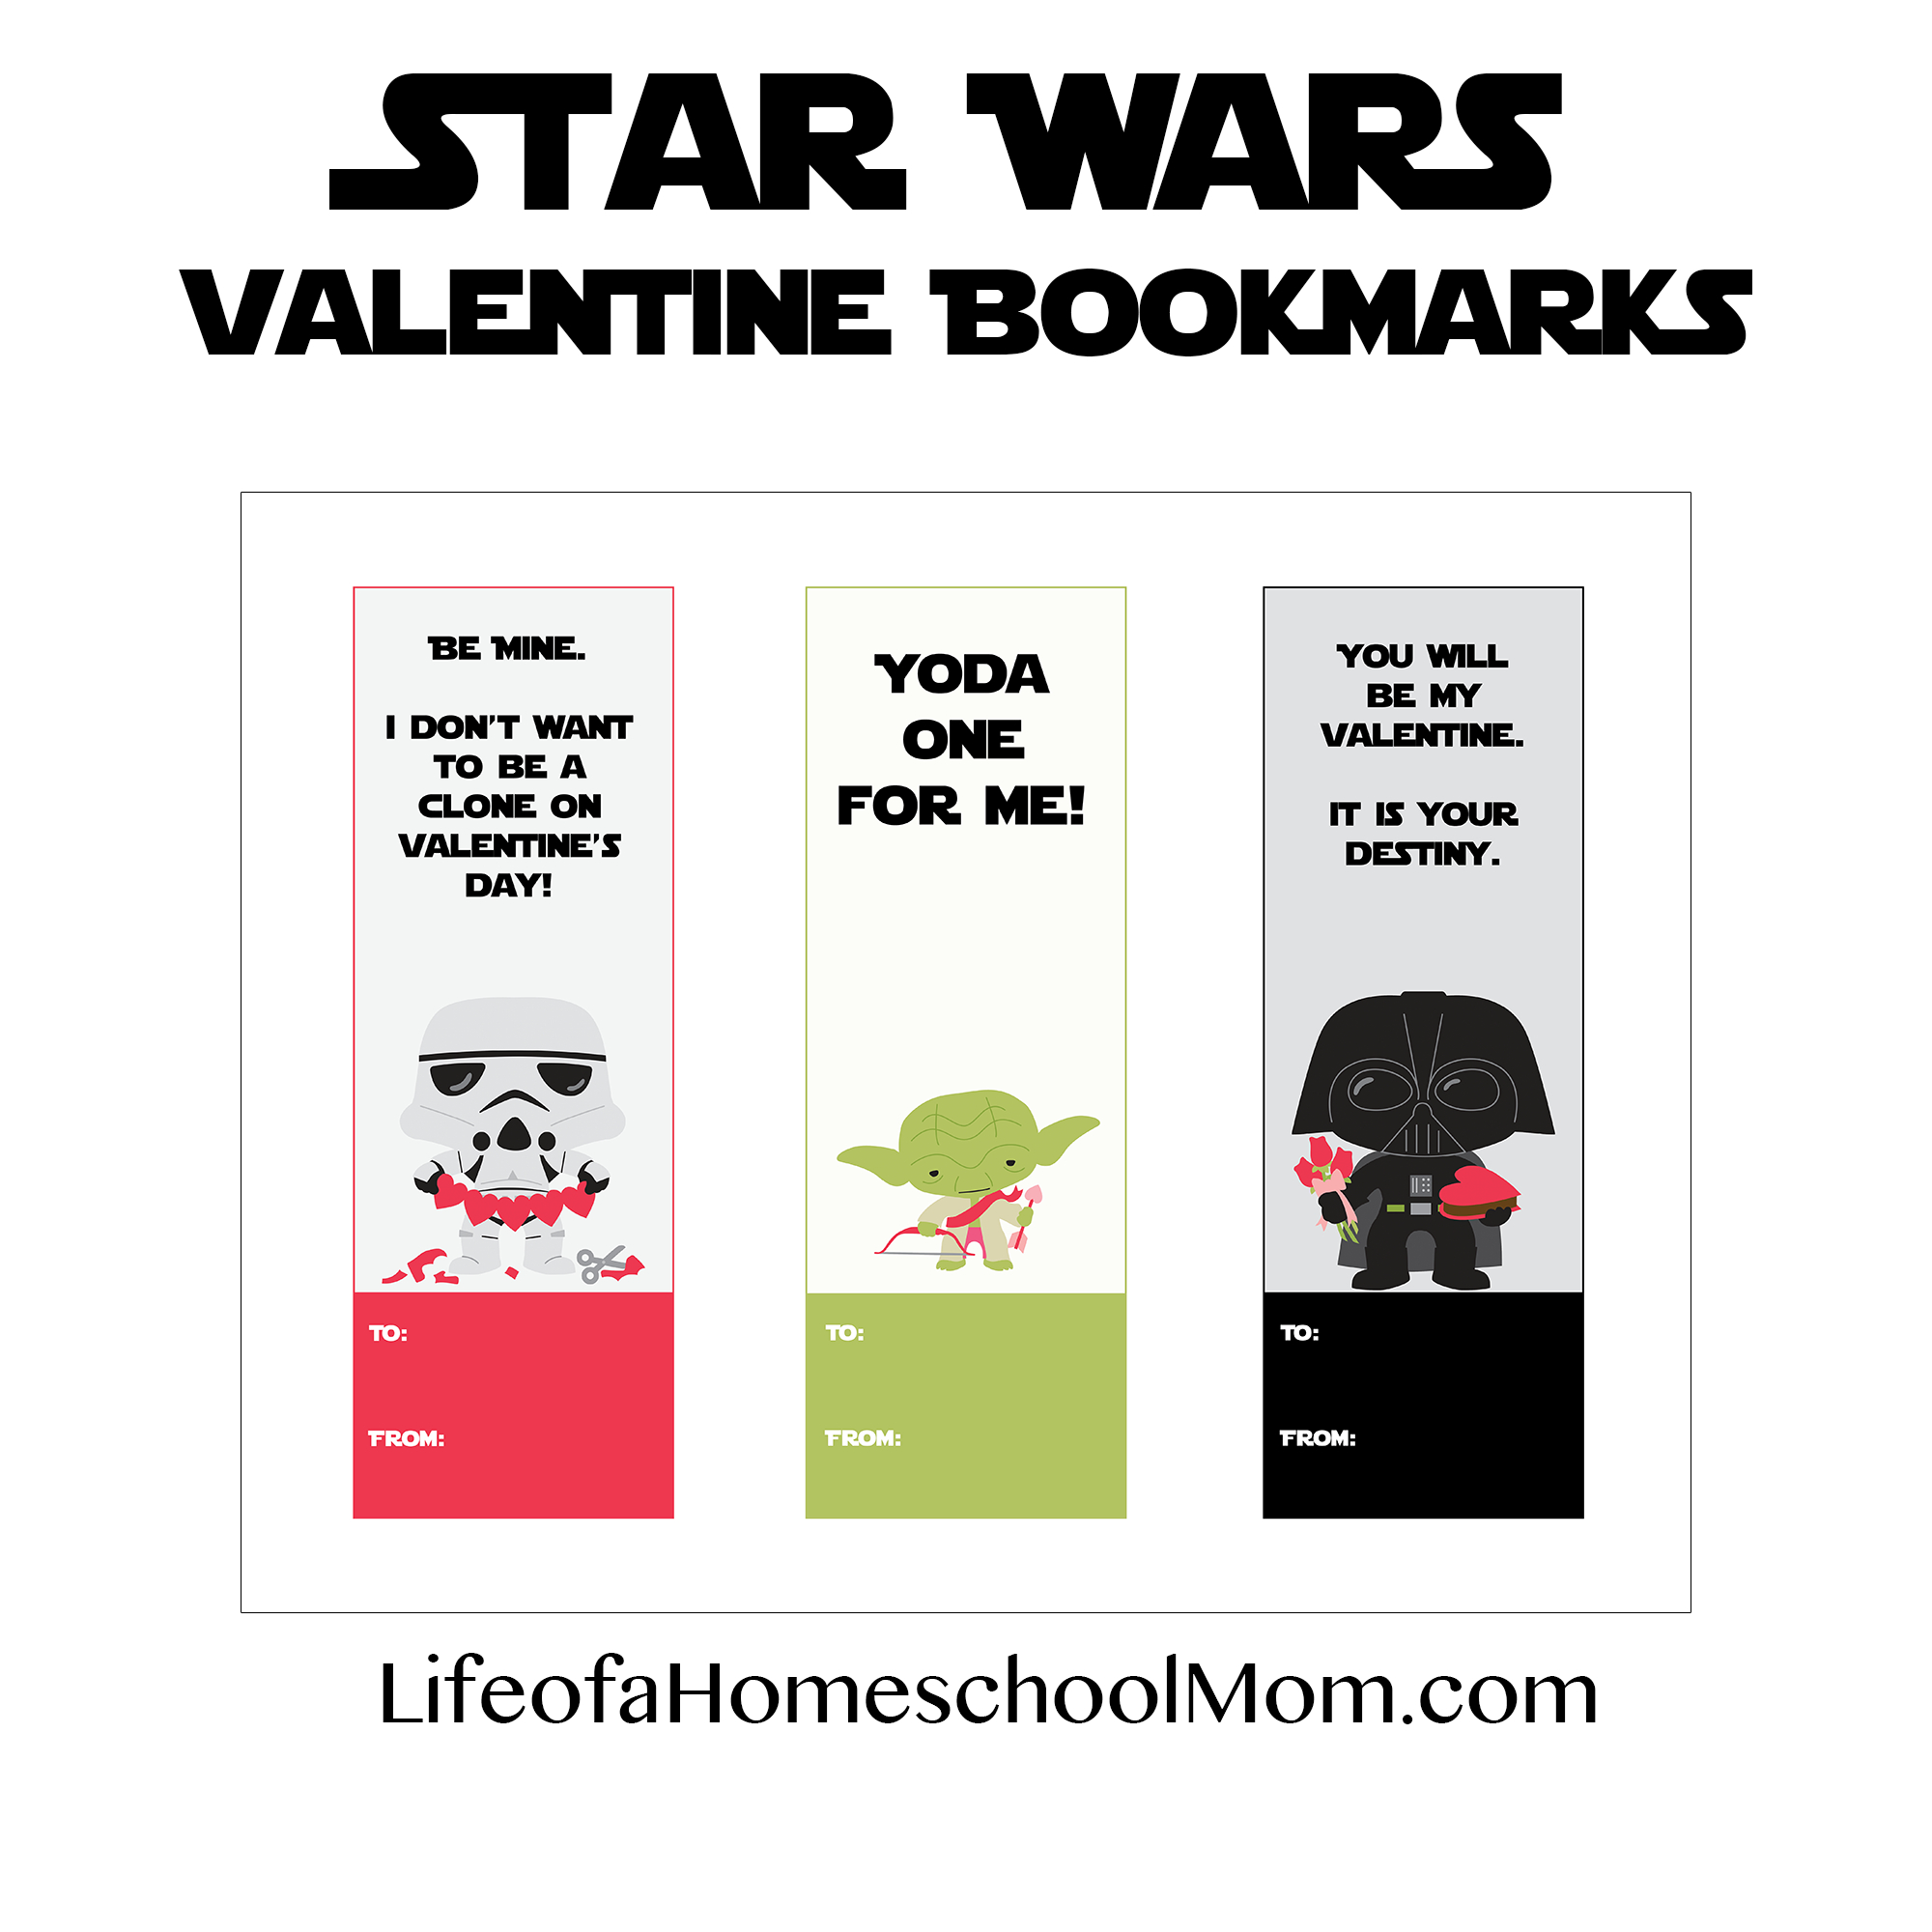 Free Printable Star Wars Valentine Bookmarks - Life Of A Homeschool Mom - Free Printable Lego Star Wars Valentines